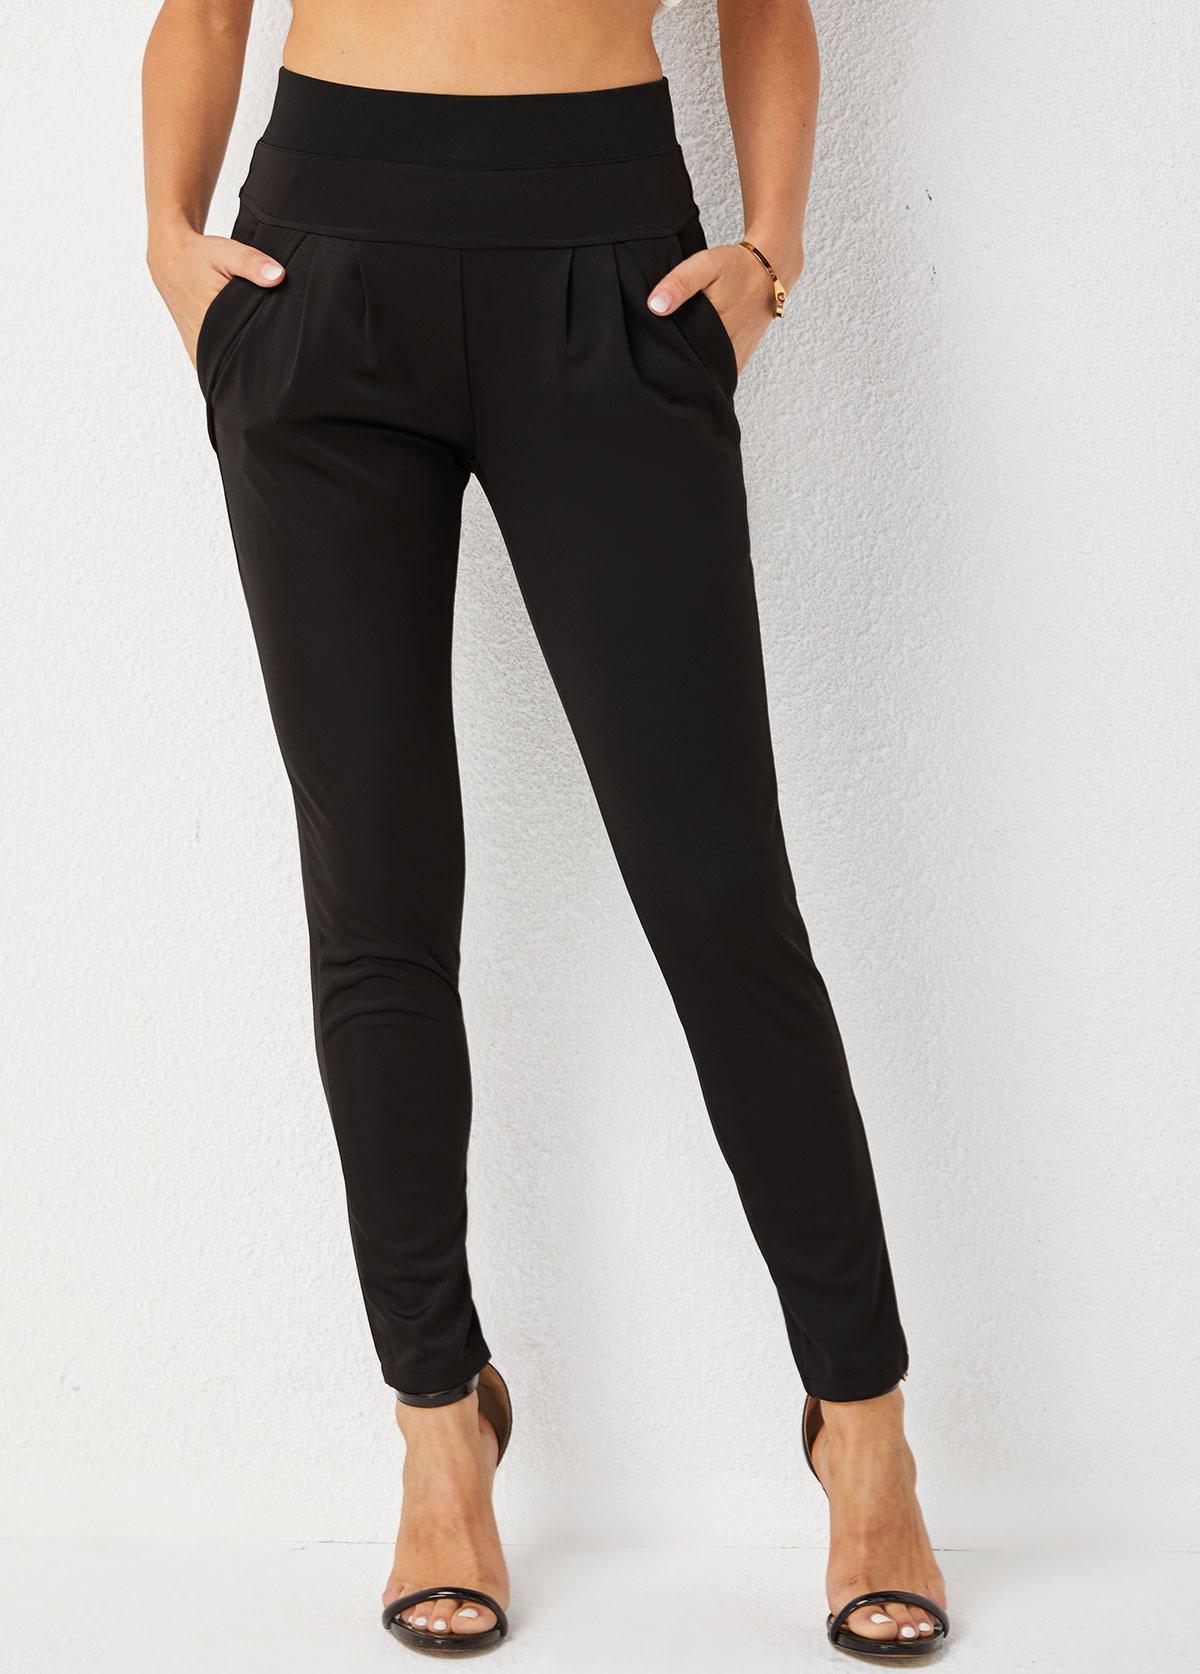 Skinny High Waisted Pocket Solid Pants